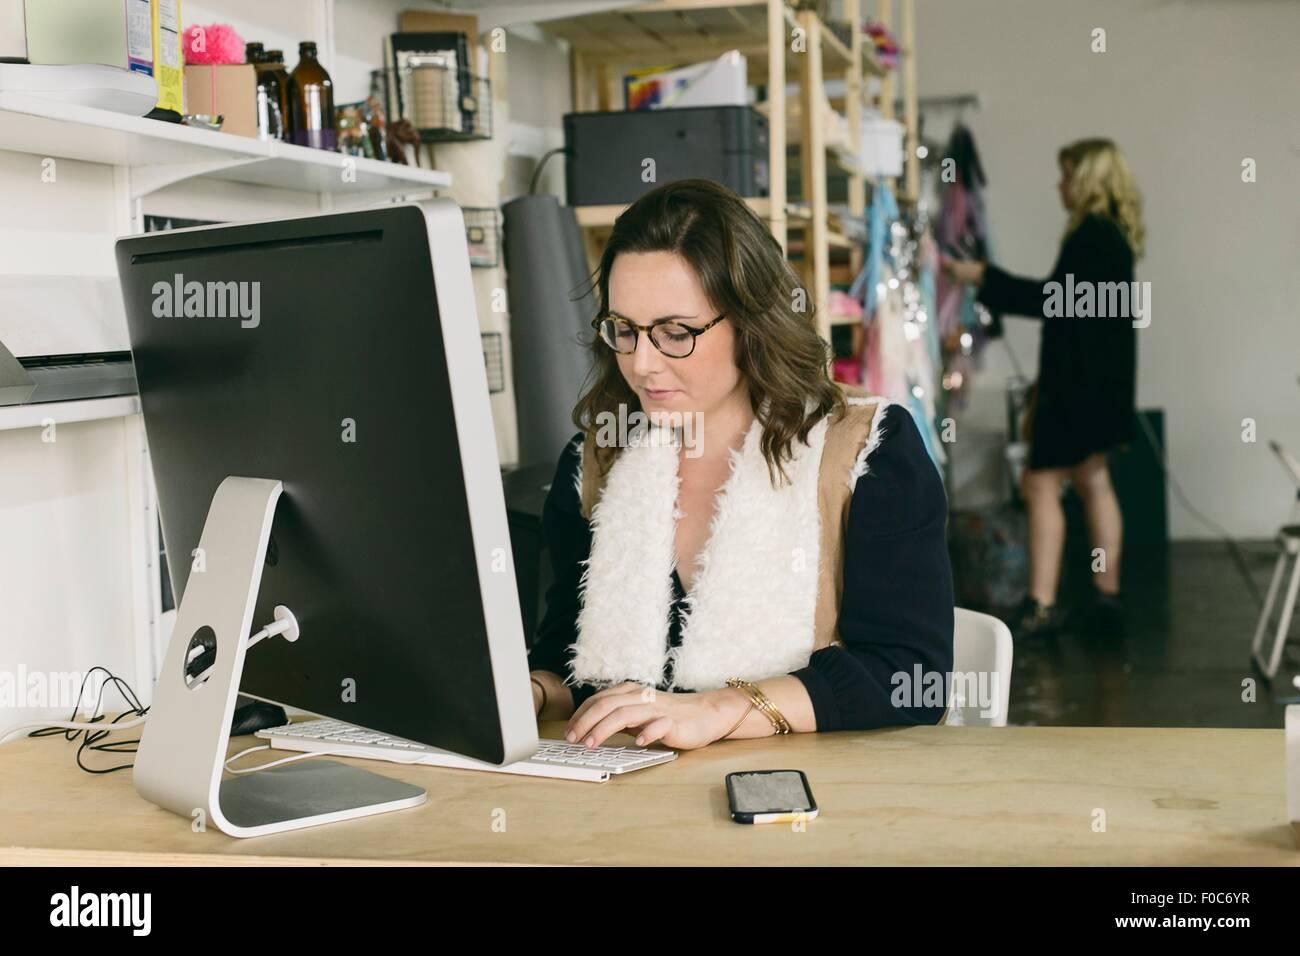 Female office worker at desk in design studio - Stock Image